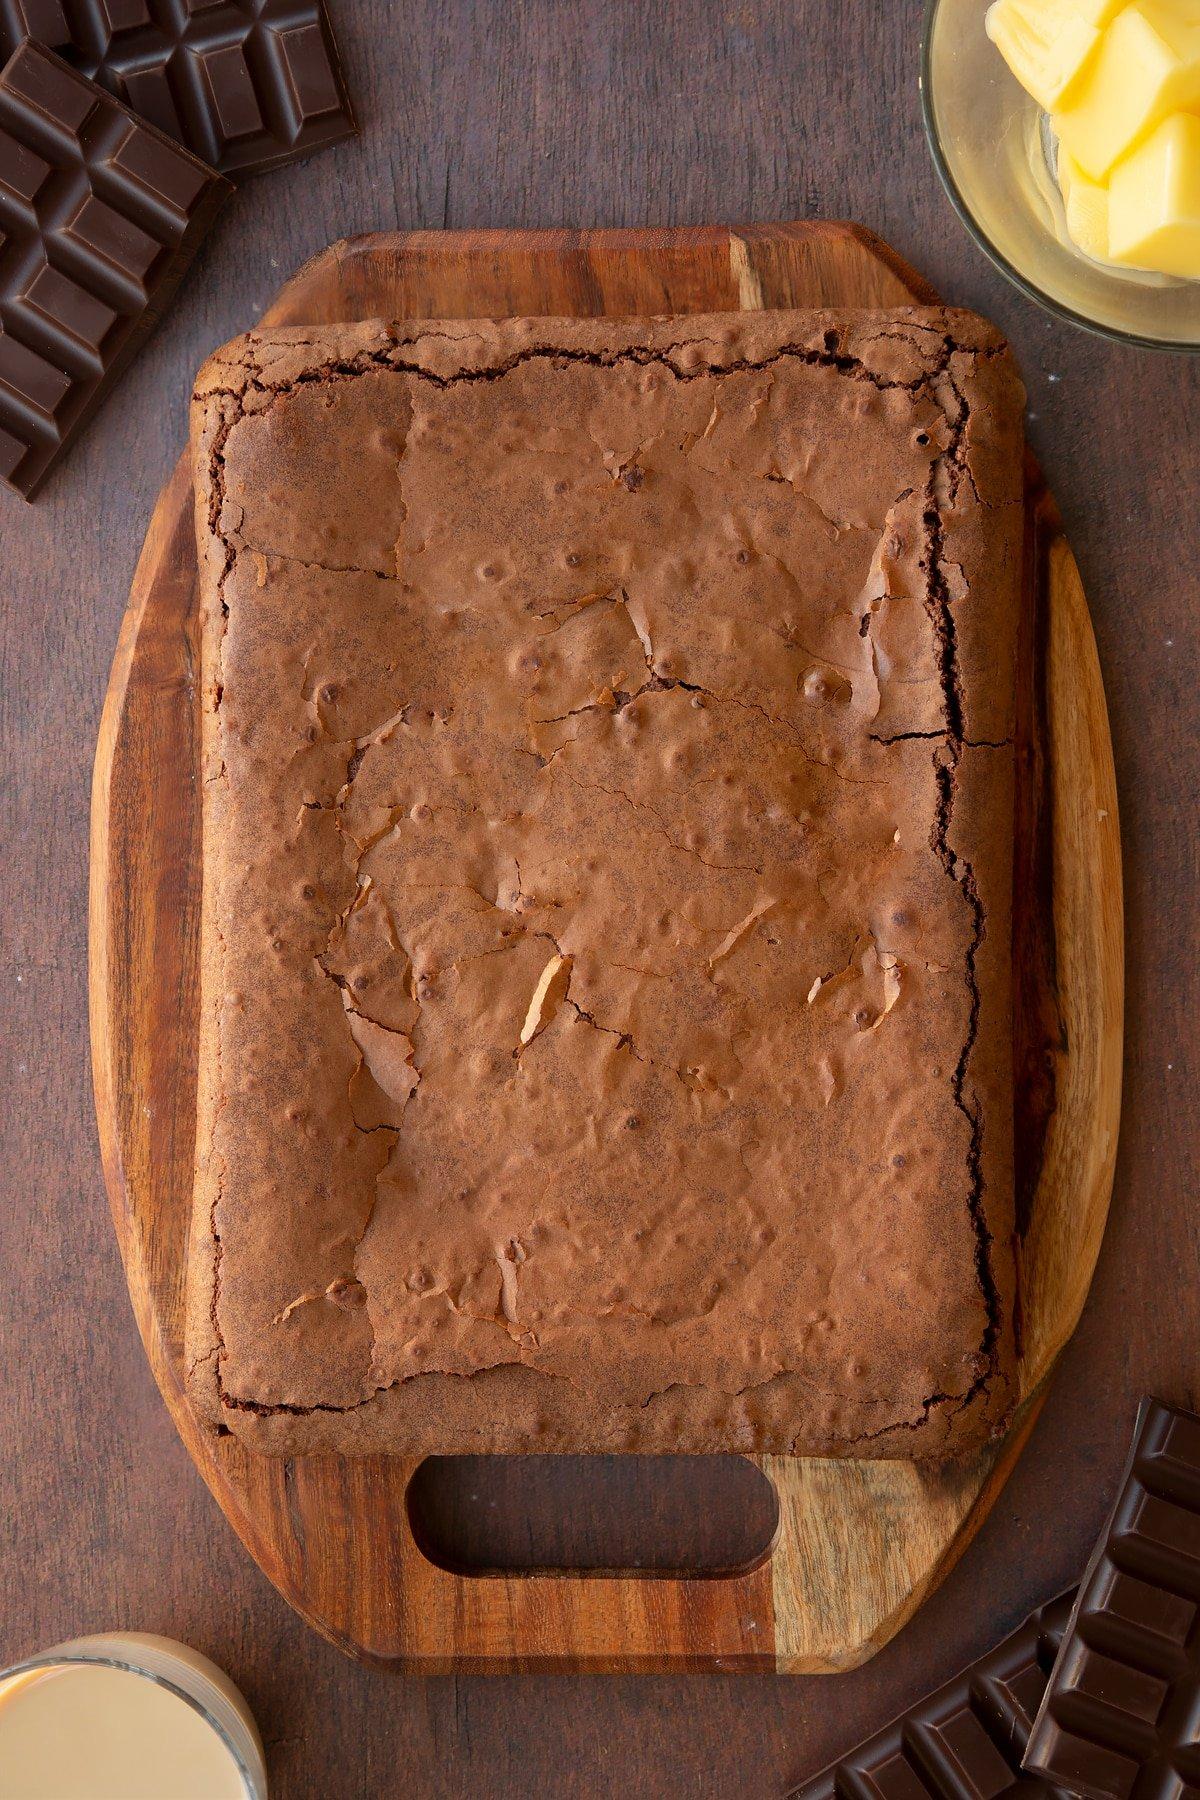 Freshly baked Baileys brownie on a board.